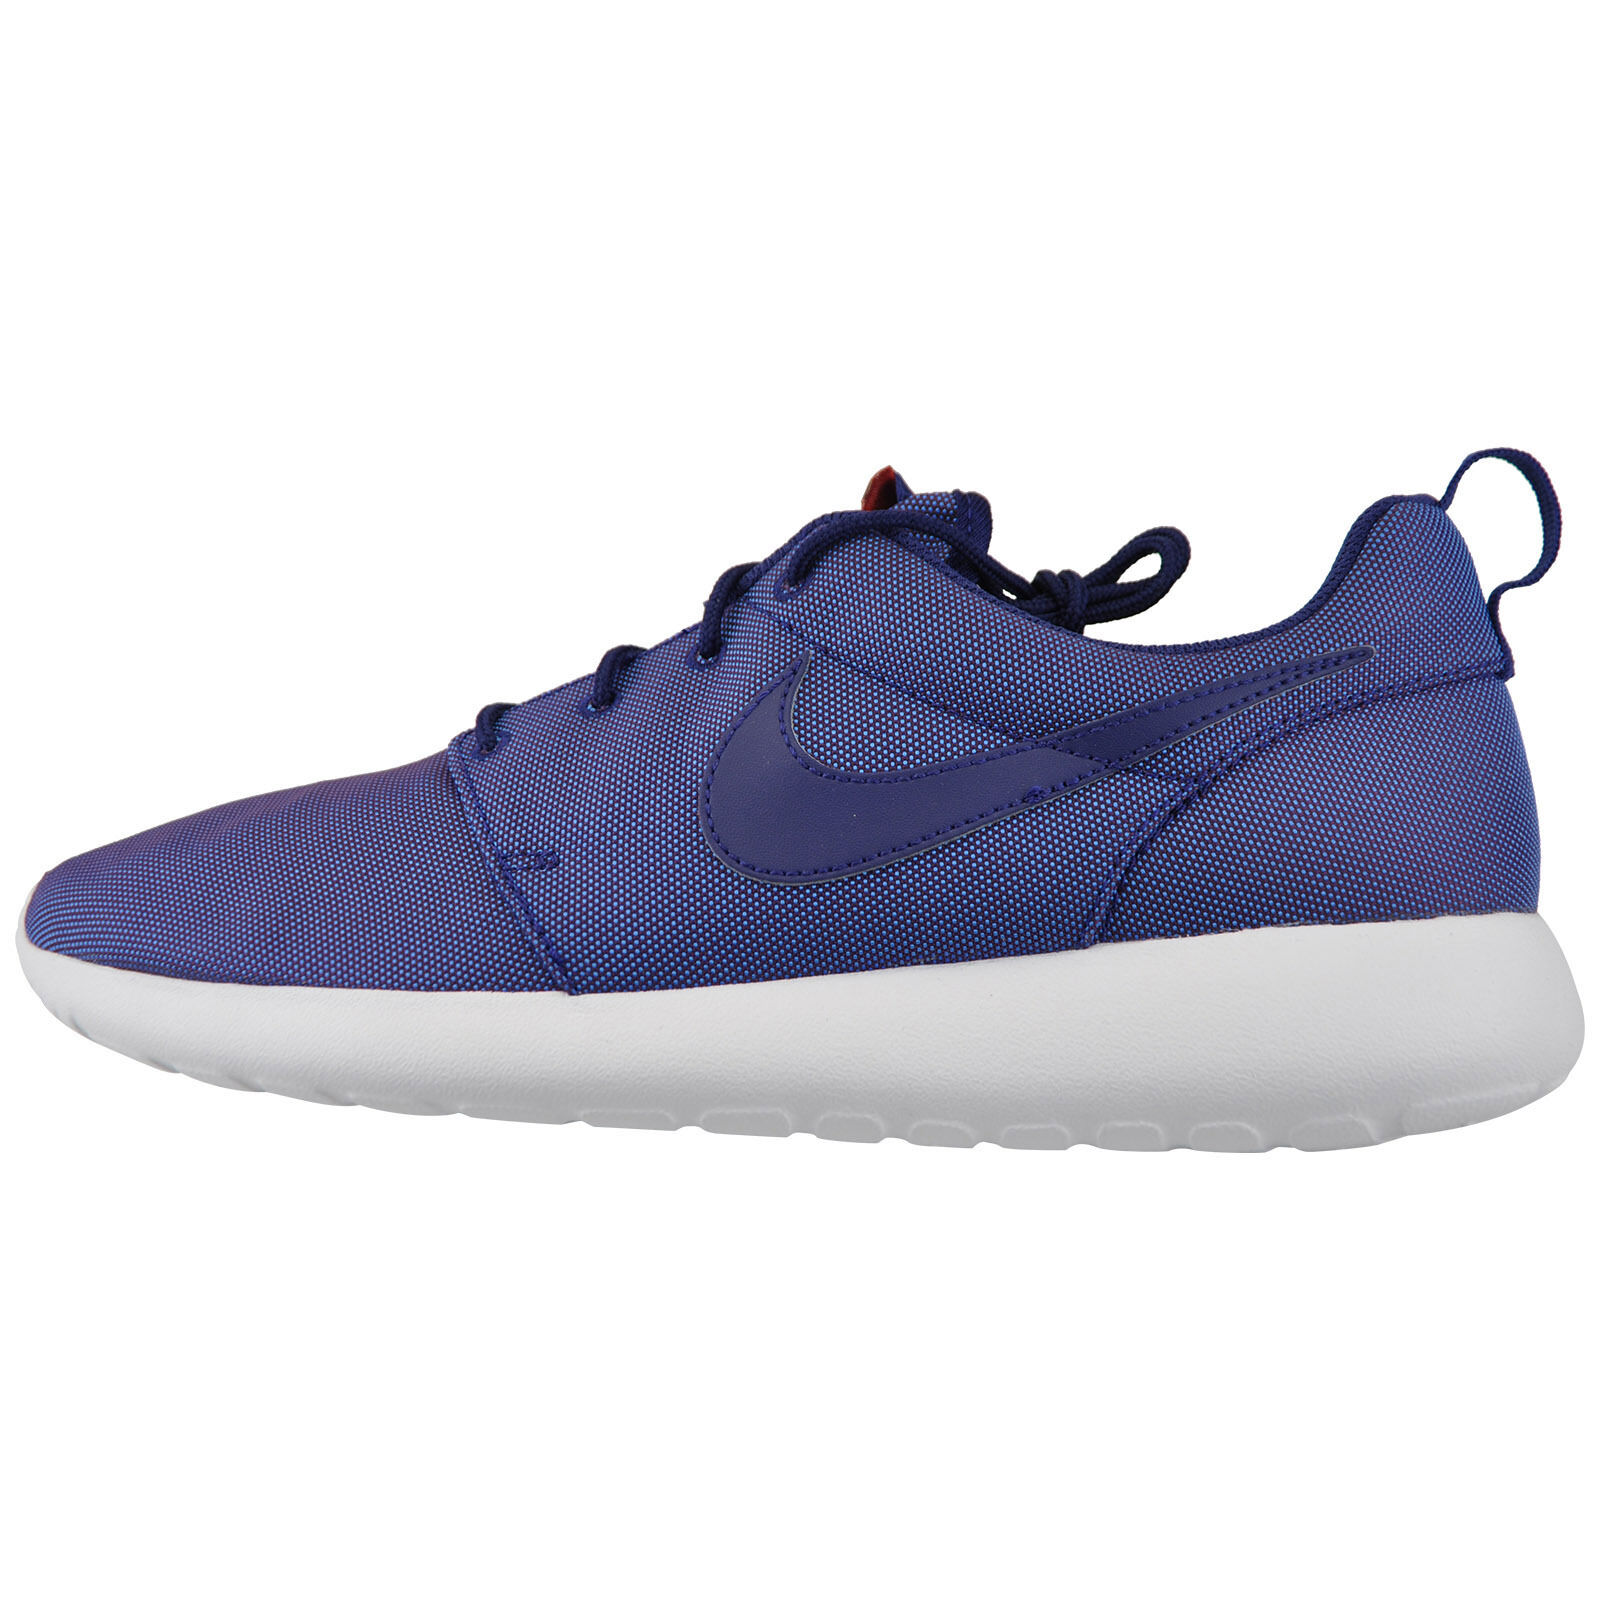 Nike Roshe One Premium 525234-442 Running Jogging Zapatillas de Correr